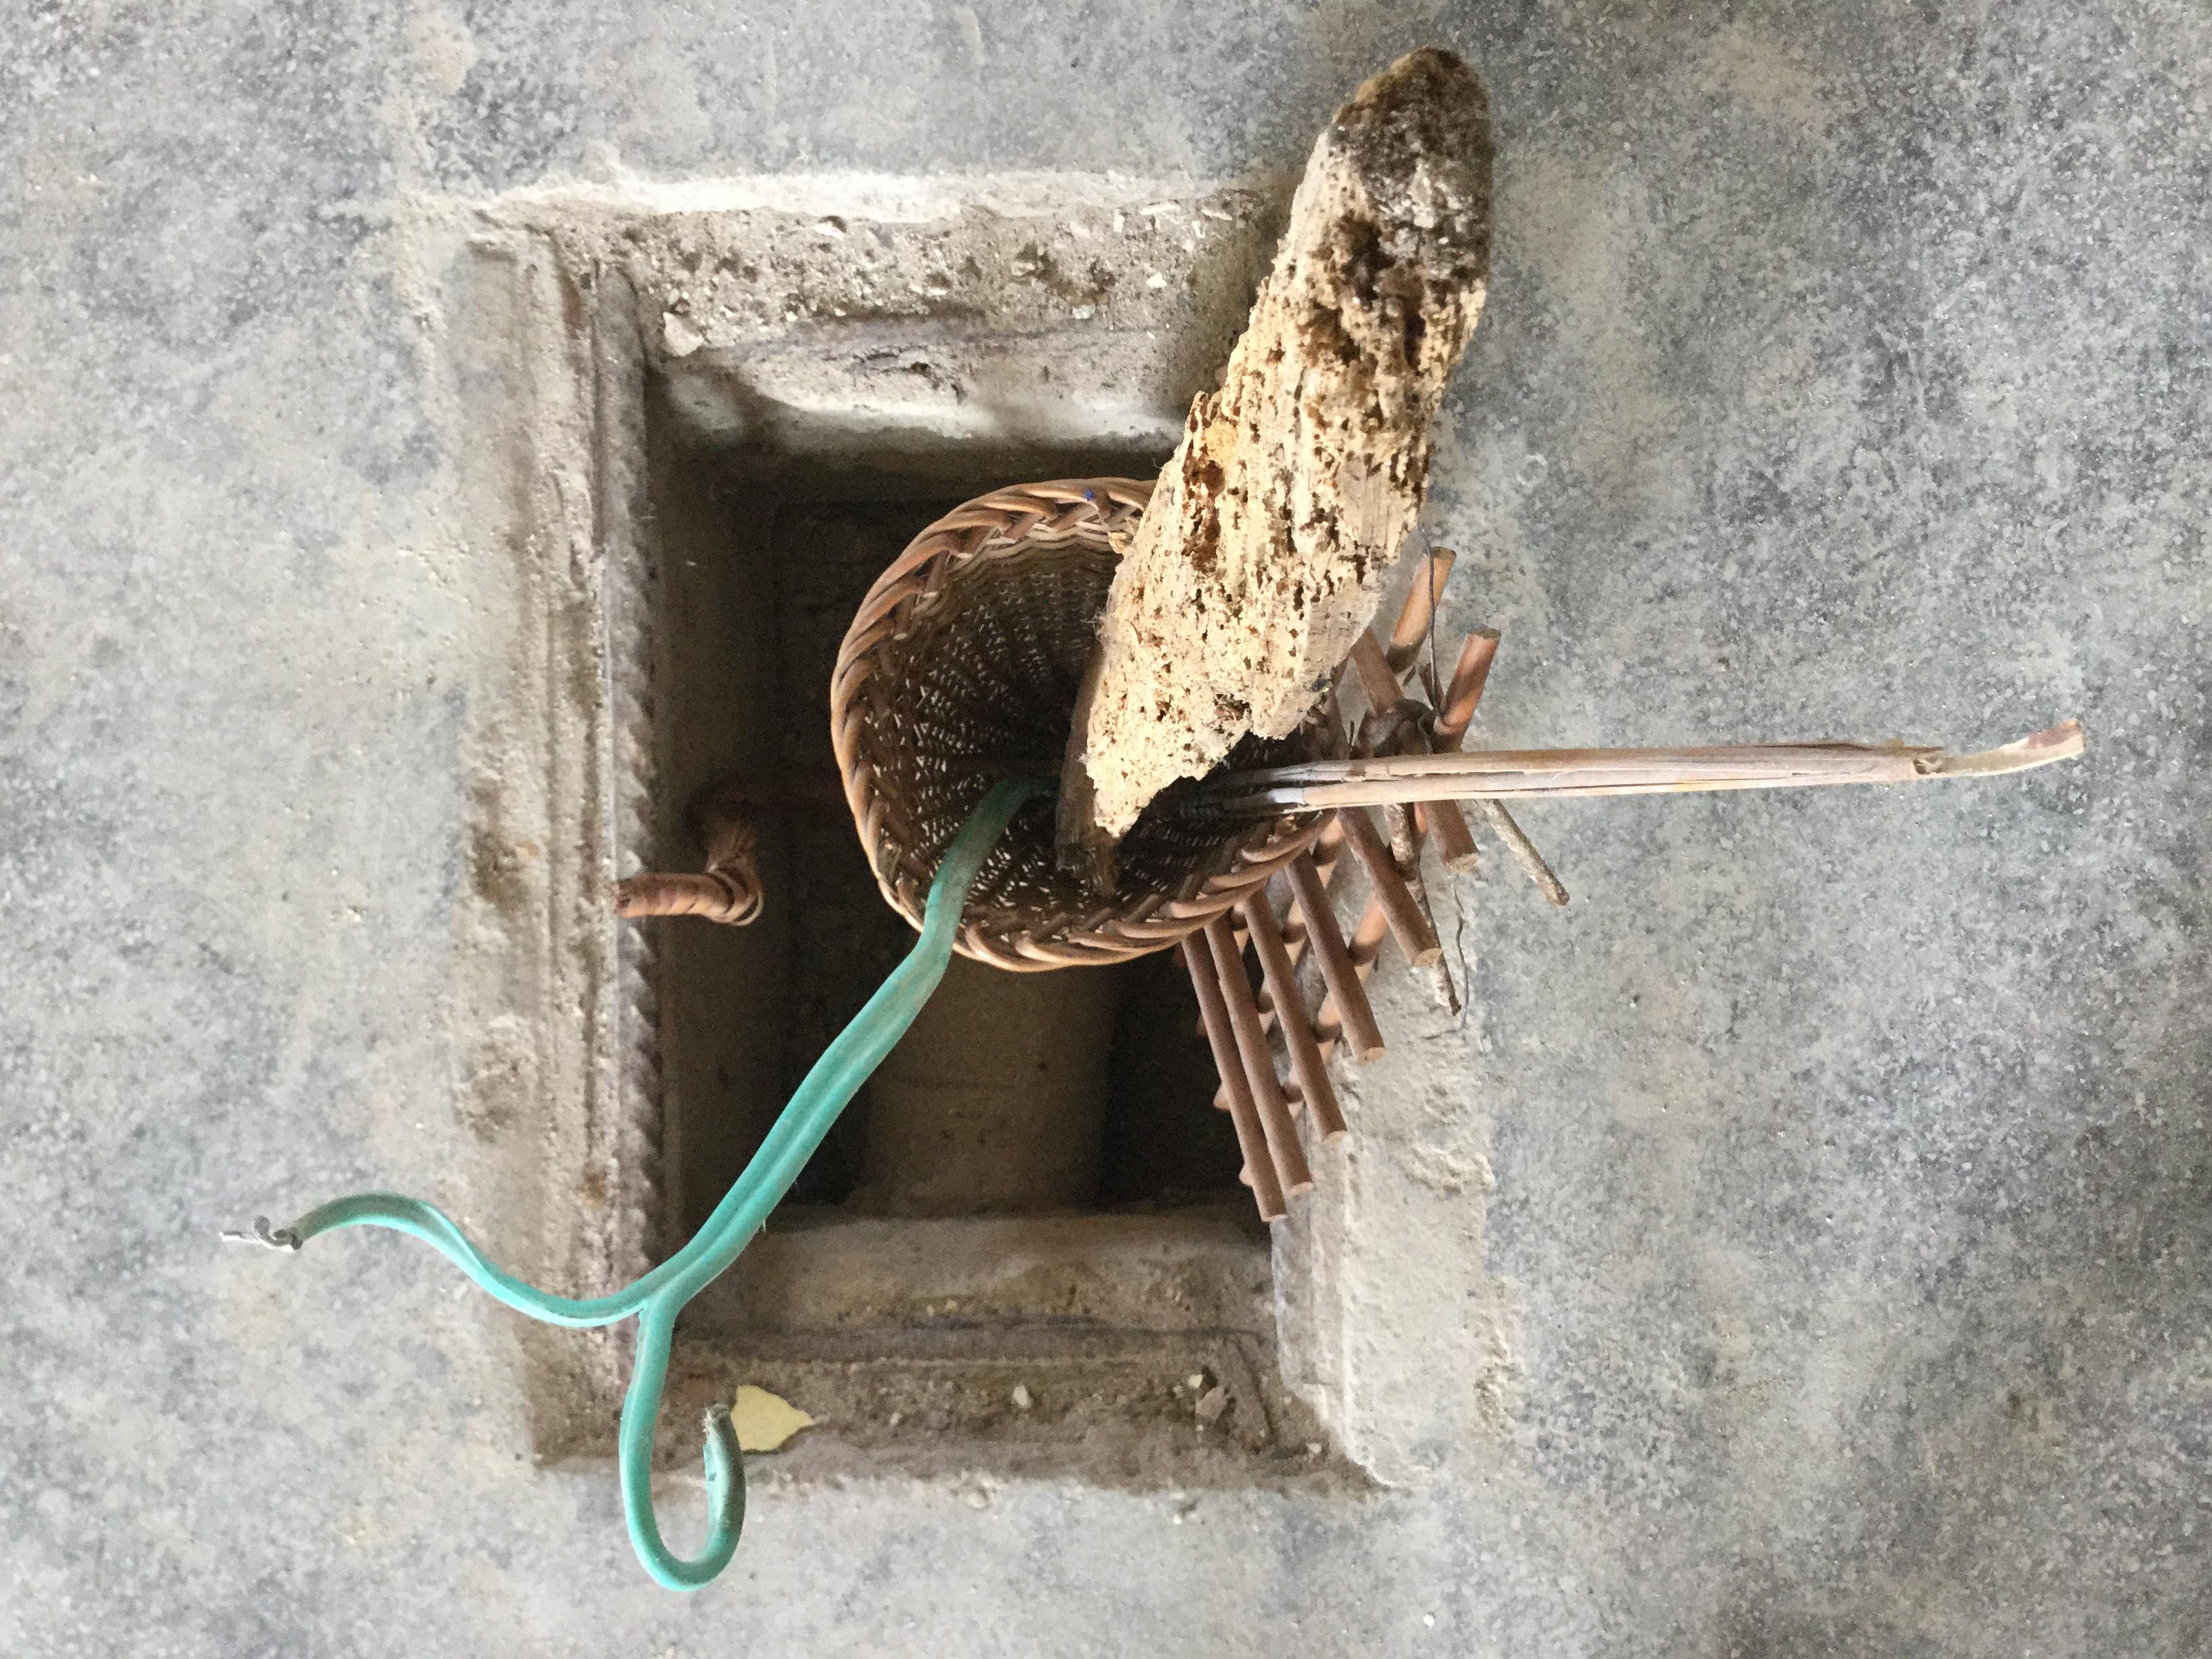 instalatia jibou teodora pica 008